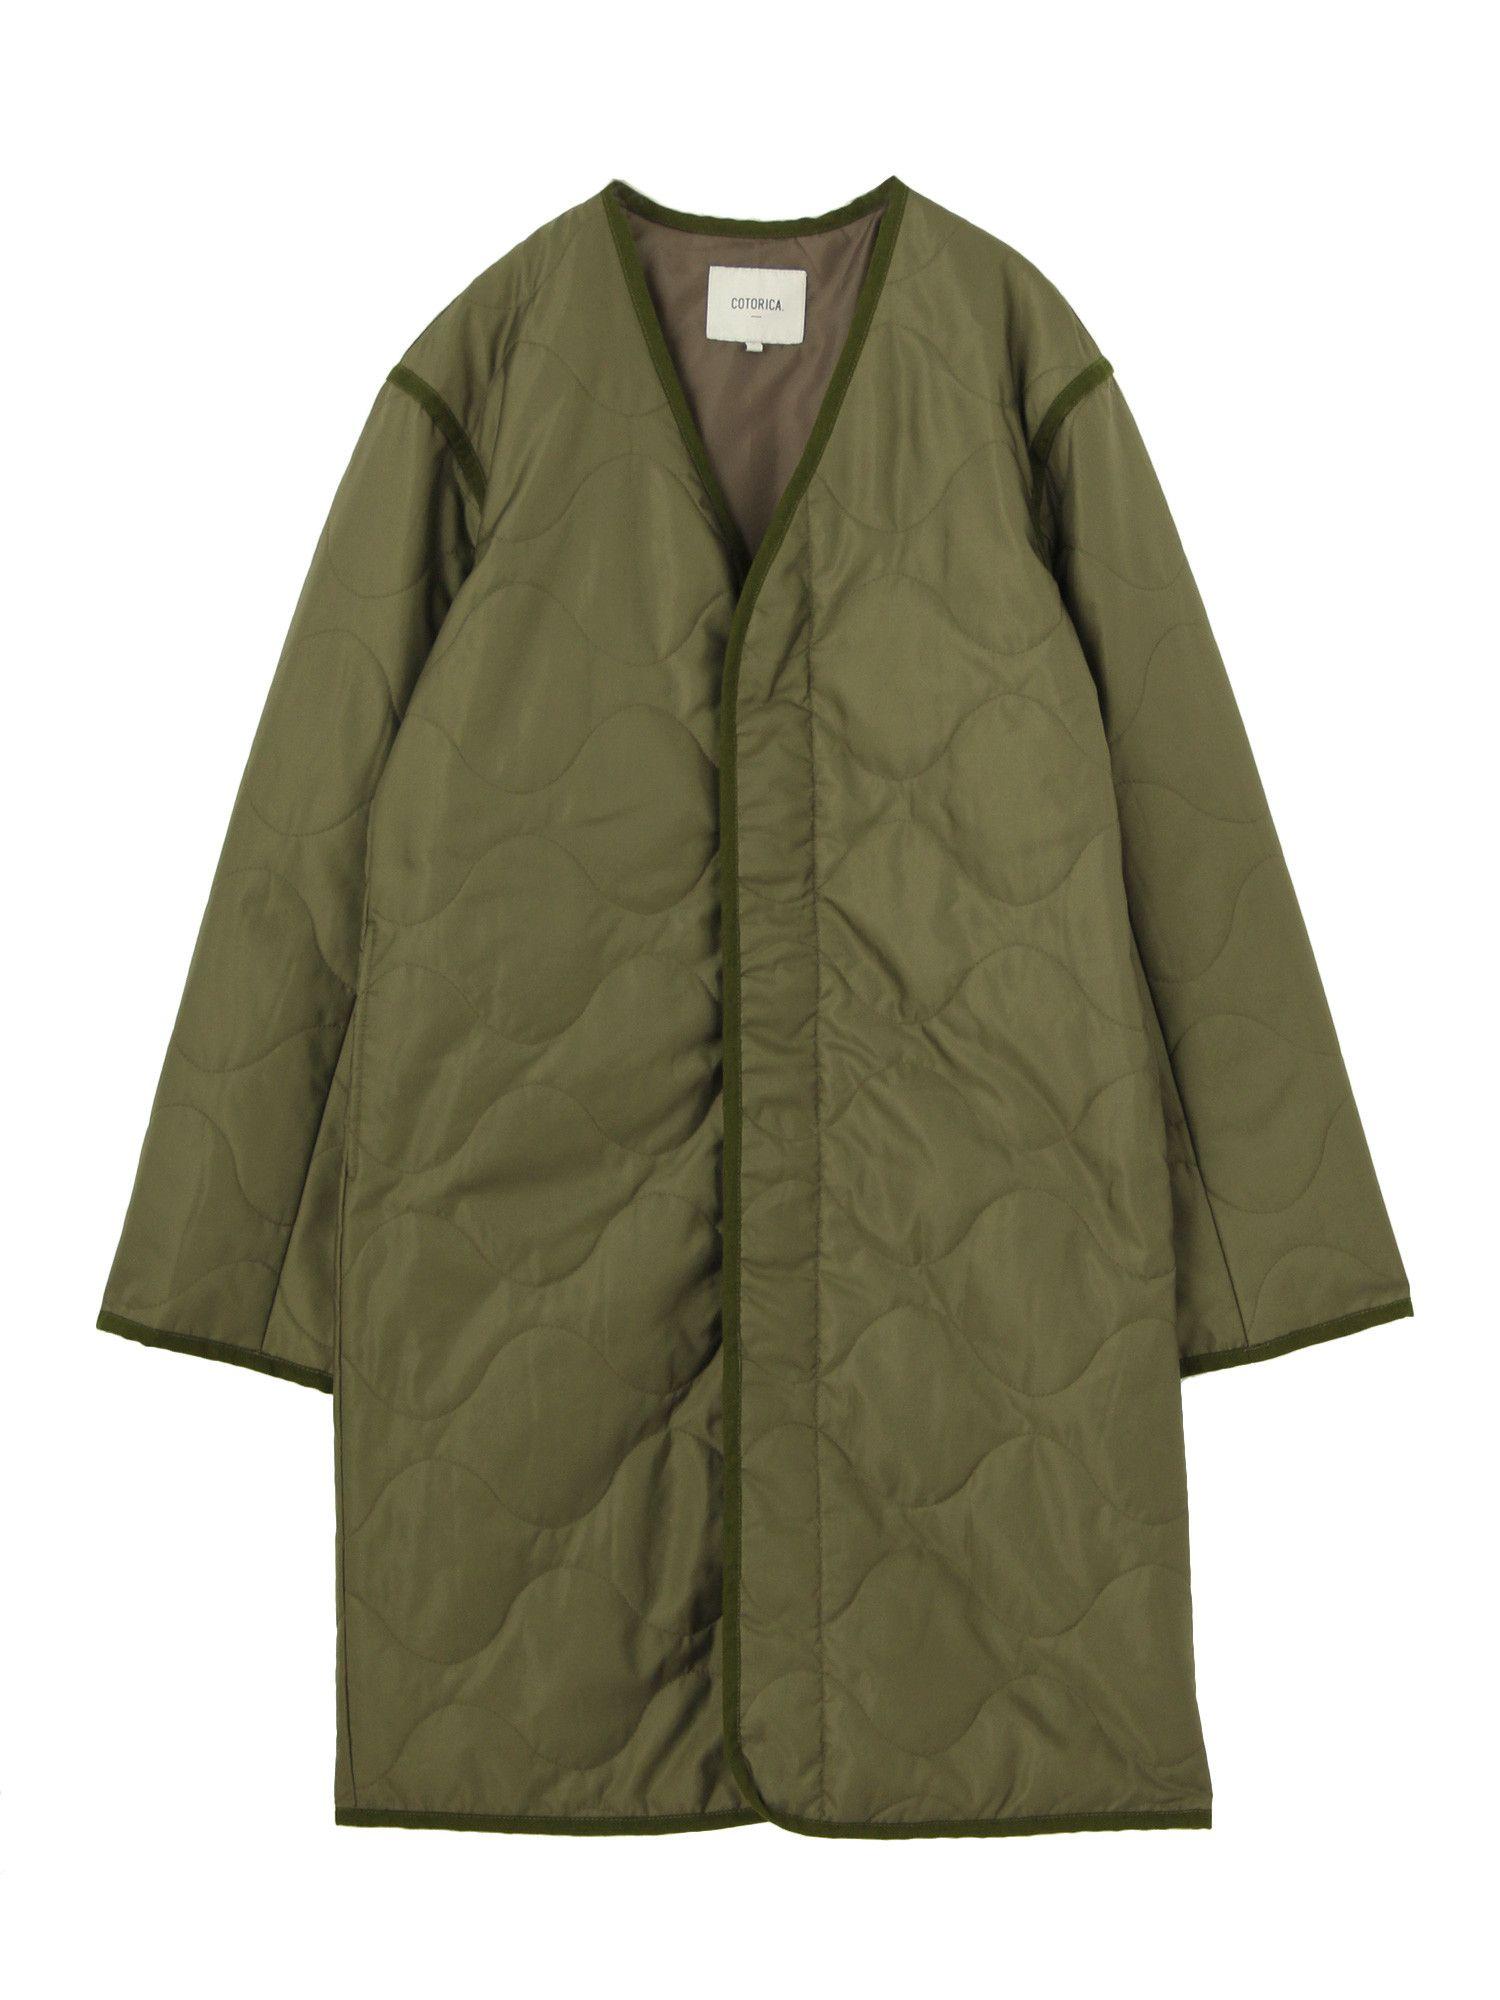 [WOMEN] Military liner coat